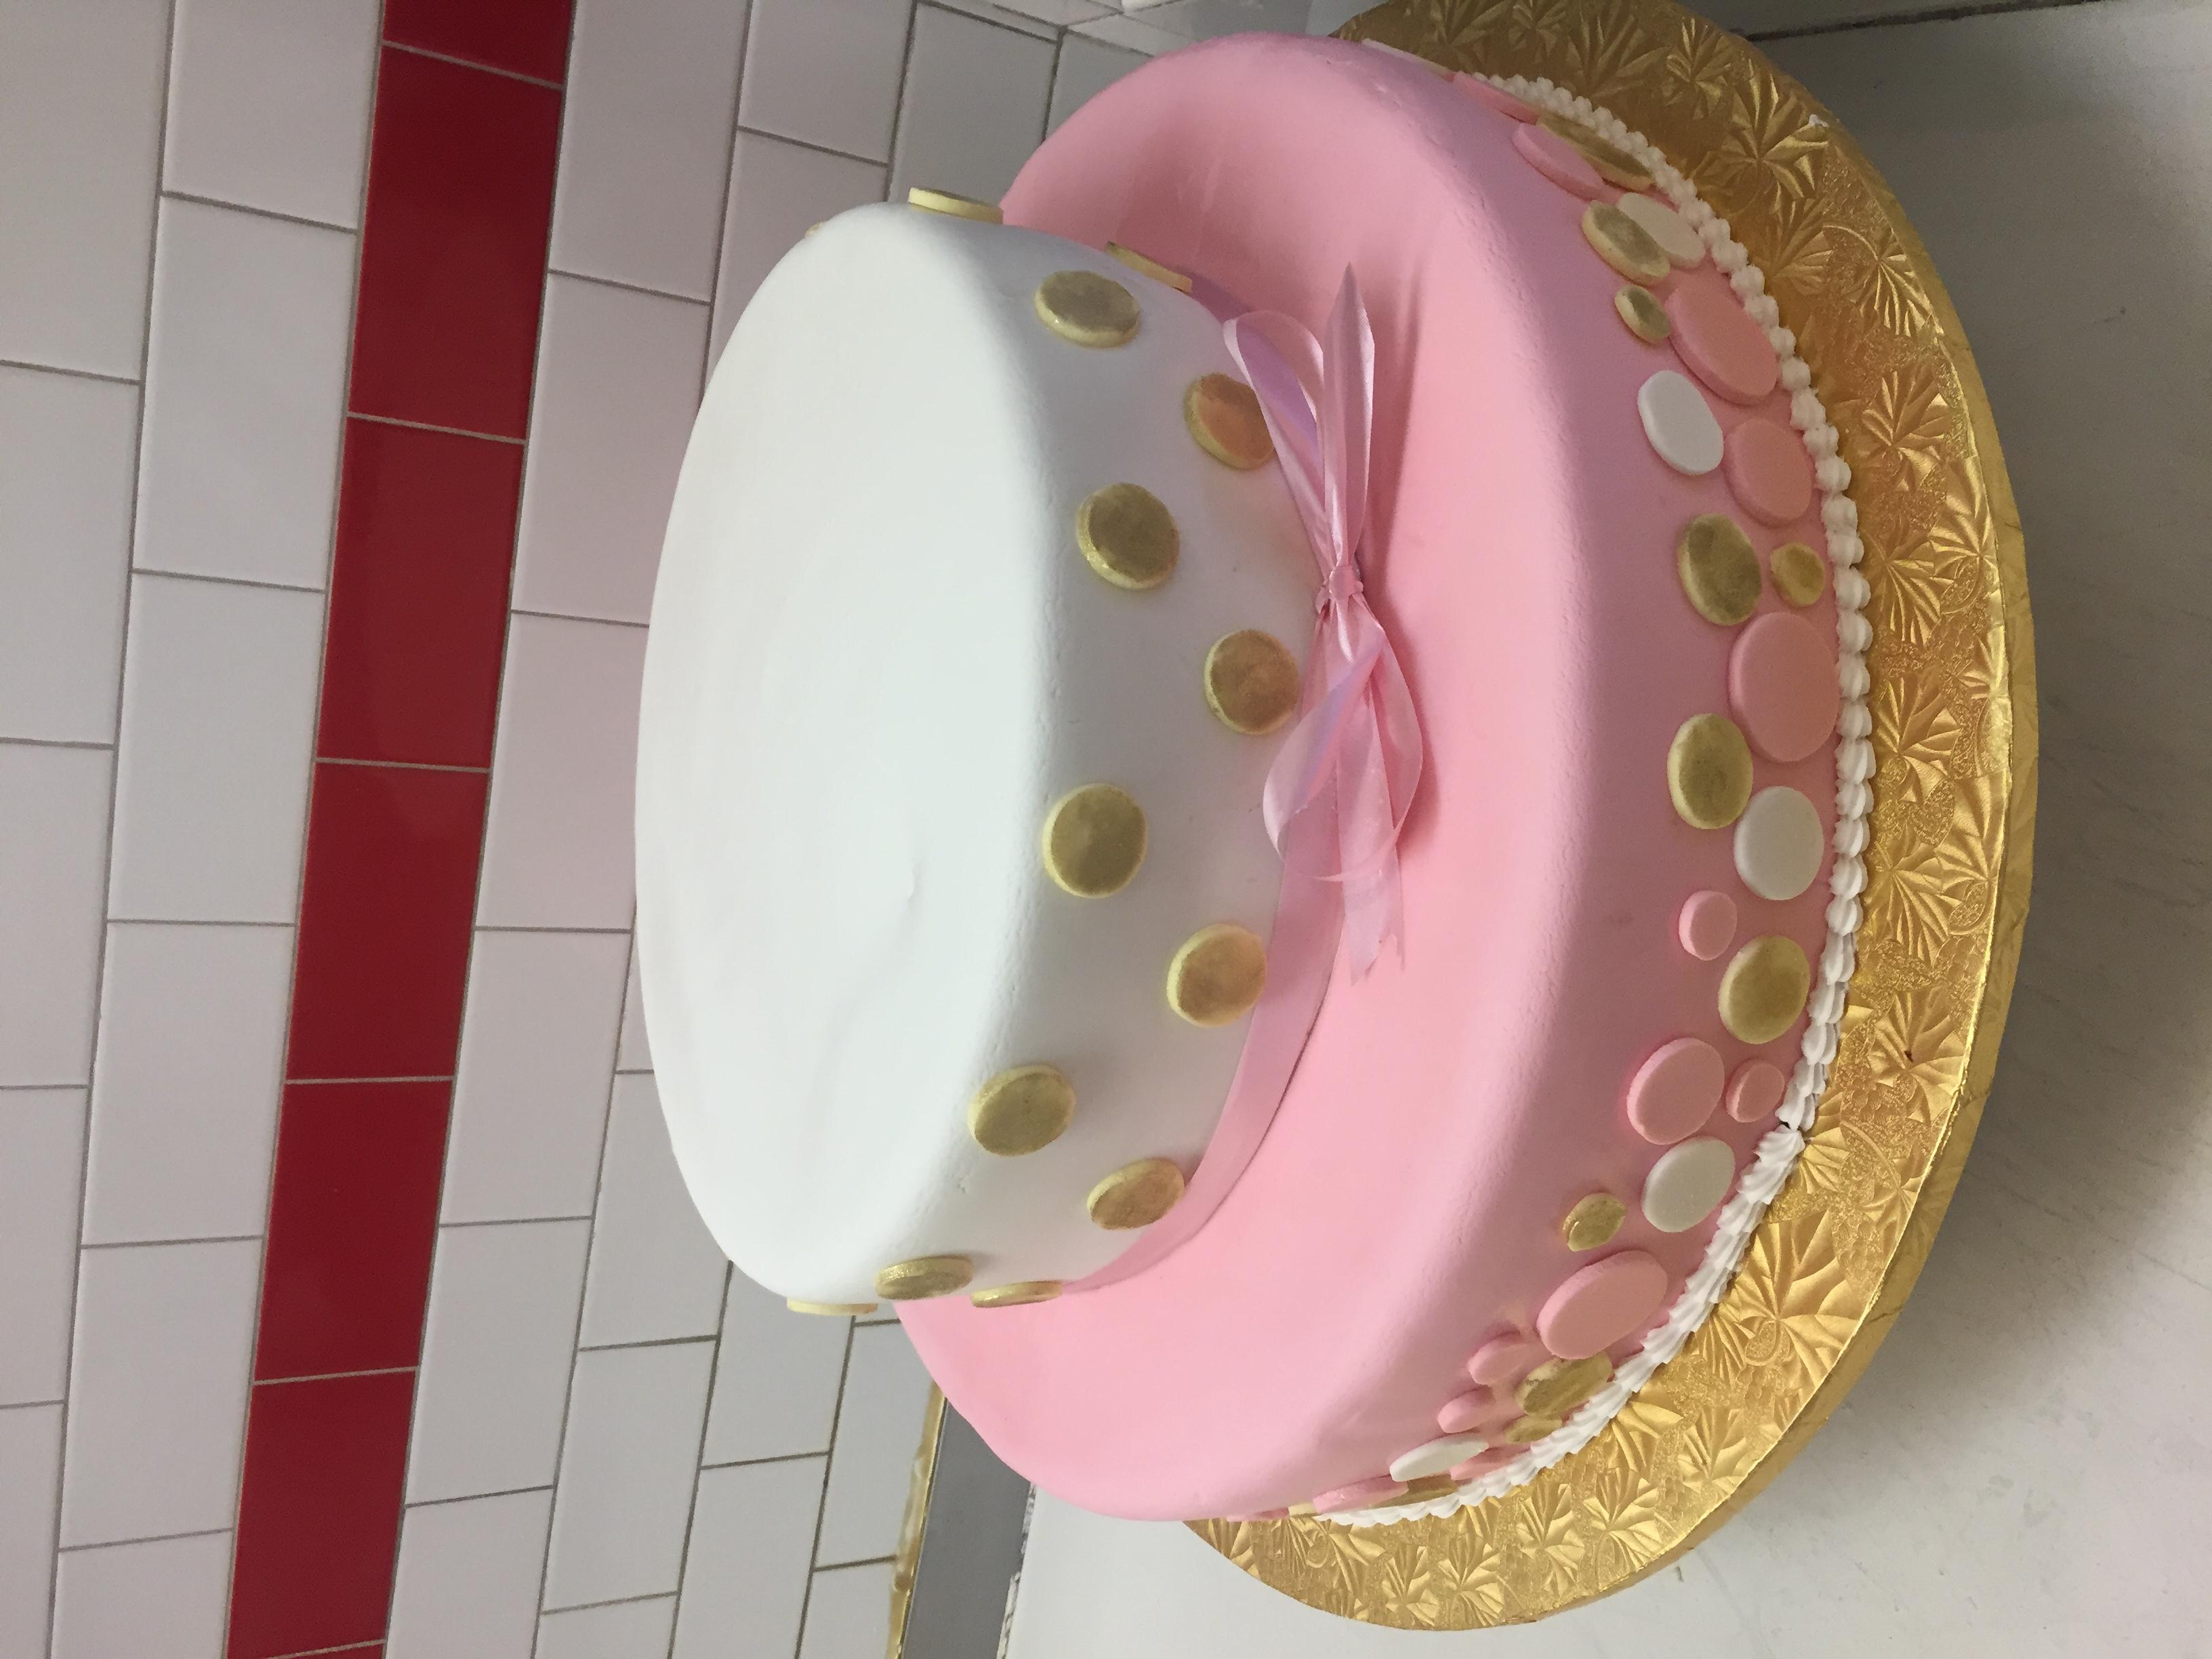 Sook Celebratory Cakes